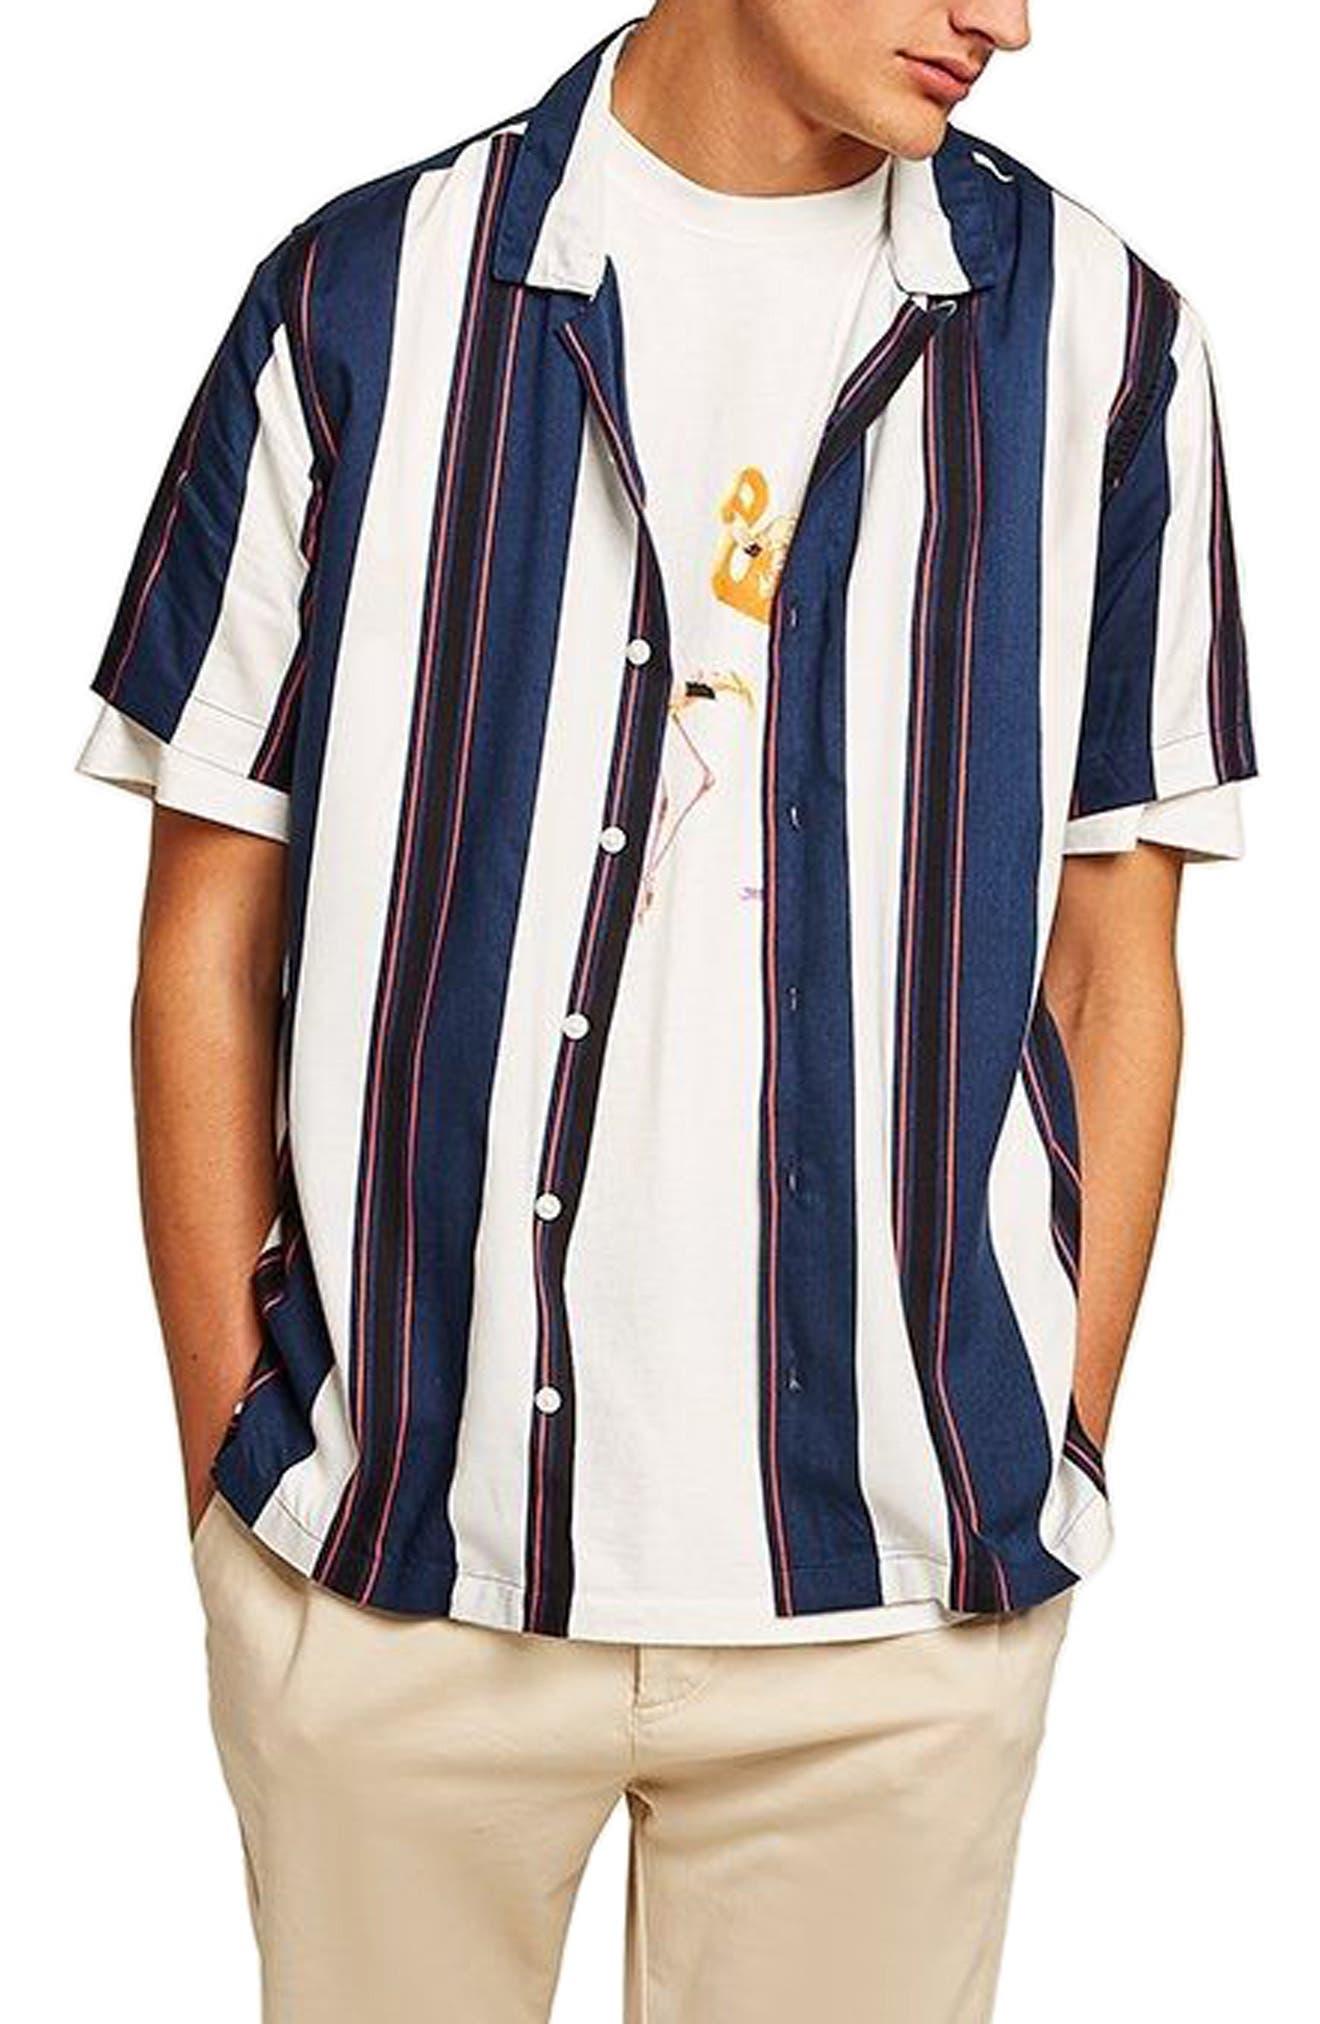 TOPMAN Stripe Camp Shirt, Main, color, 410